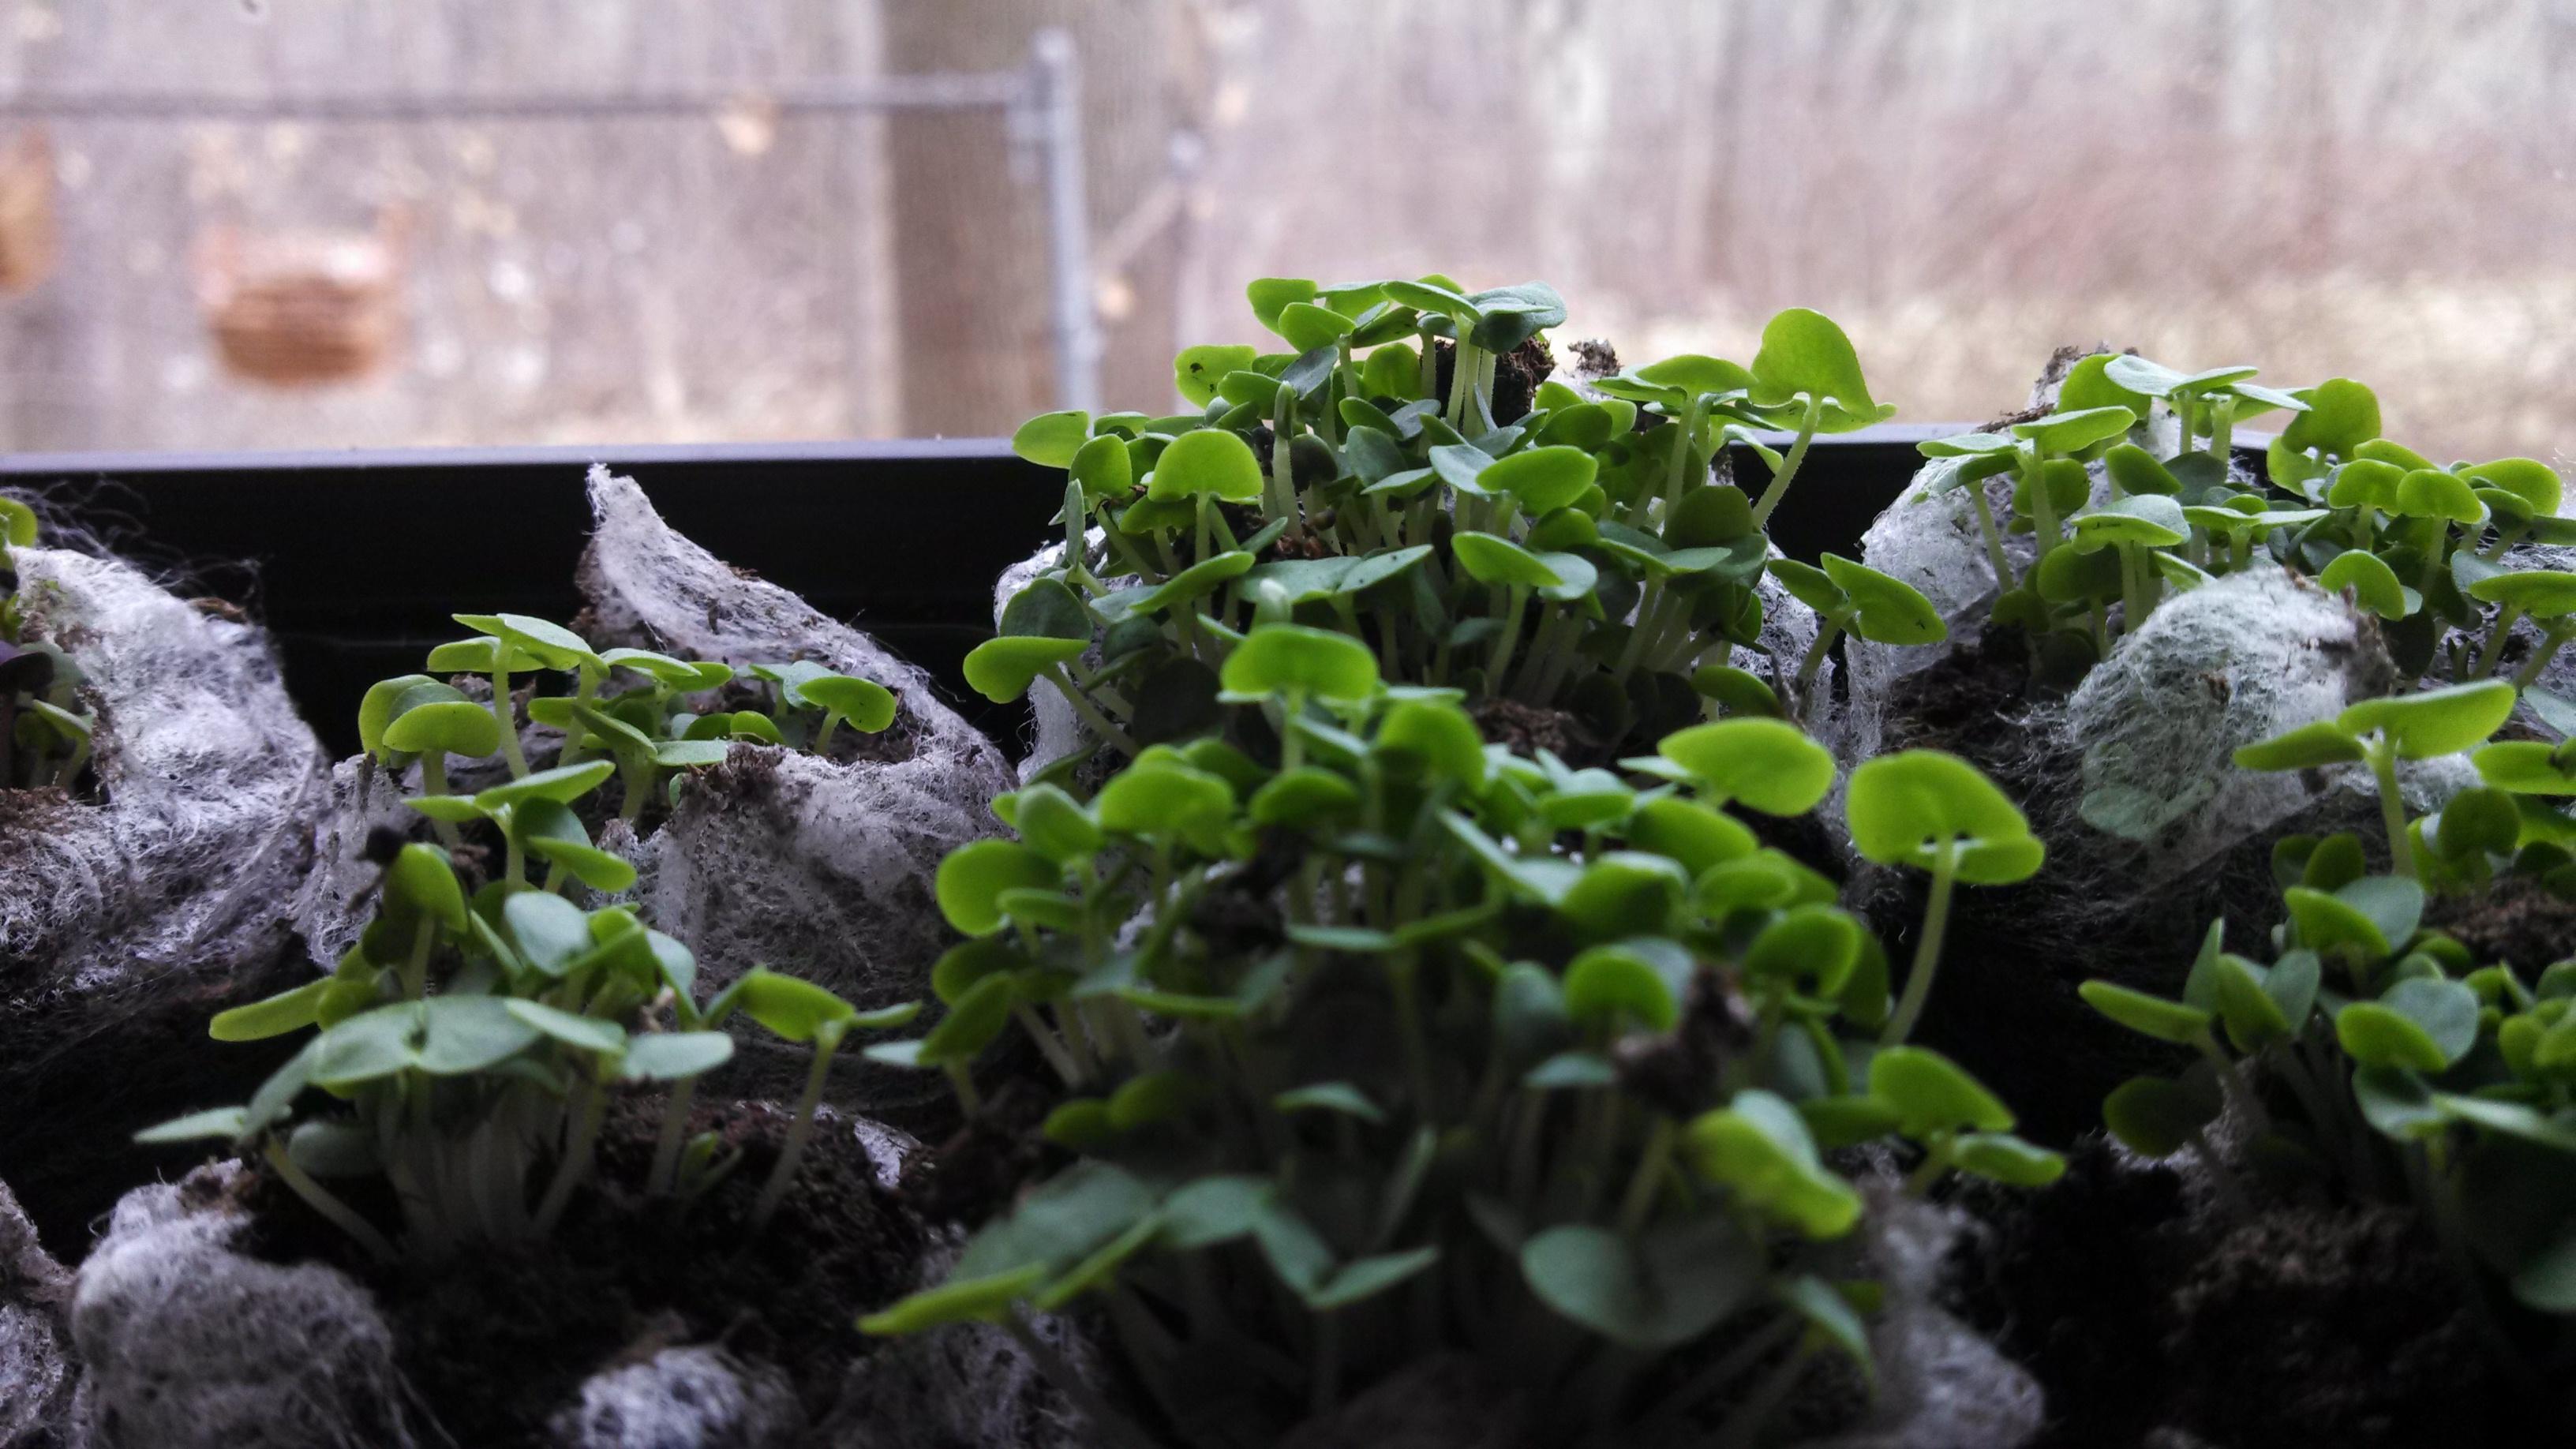 Organic window gardening